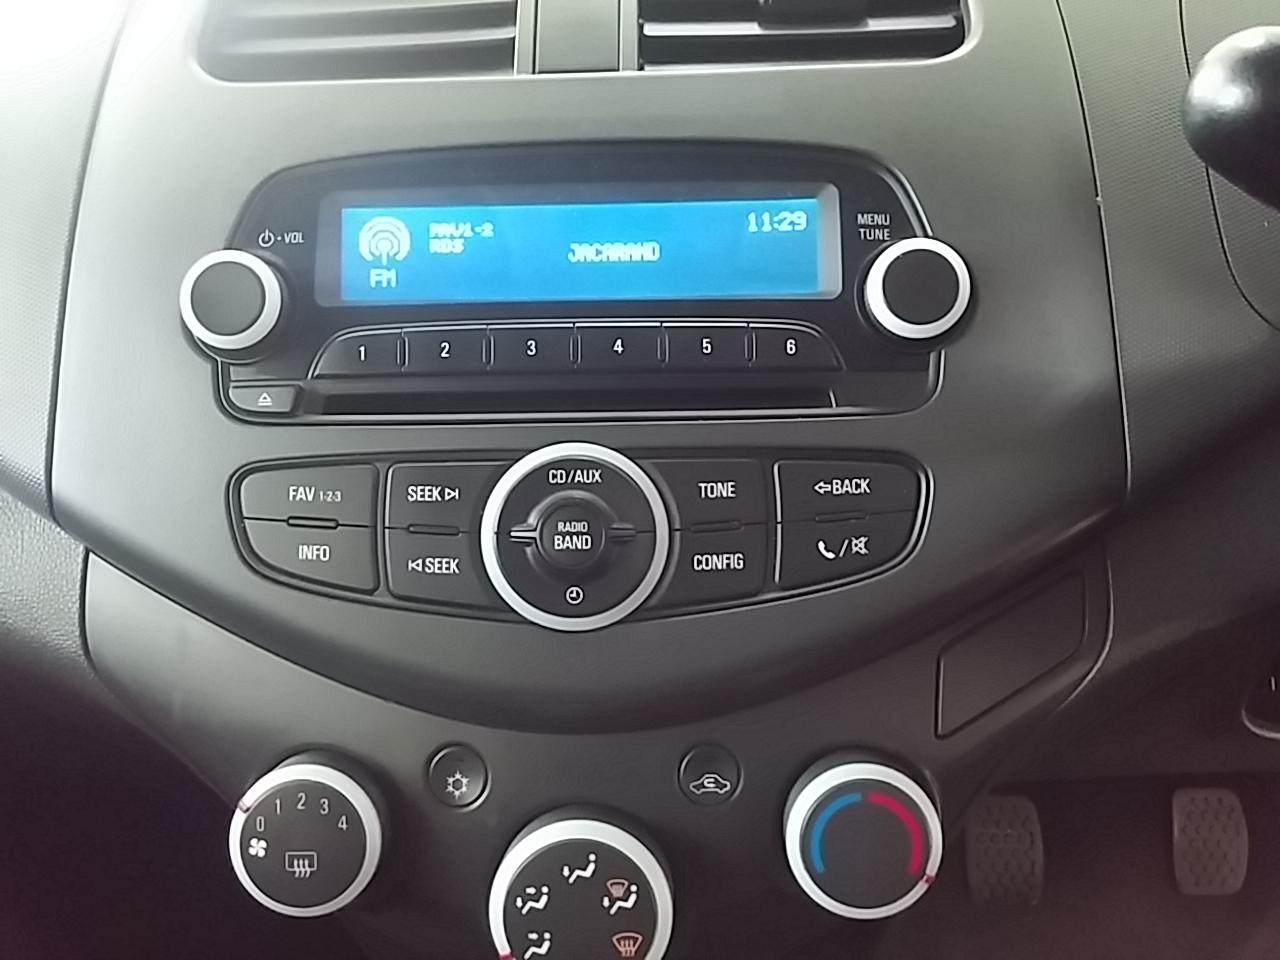 Chevrolet Spark 1.2 L 5dr